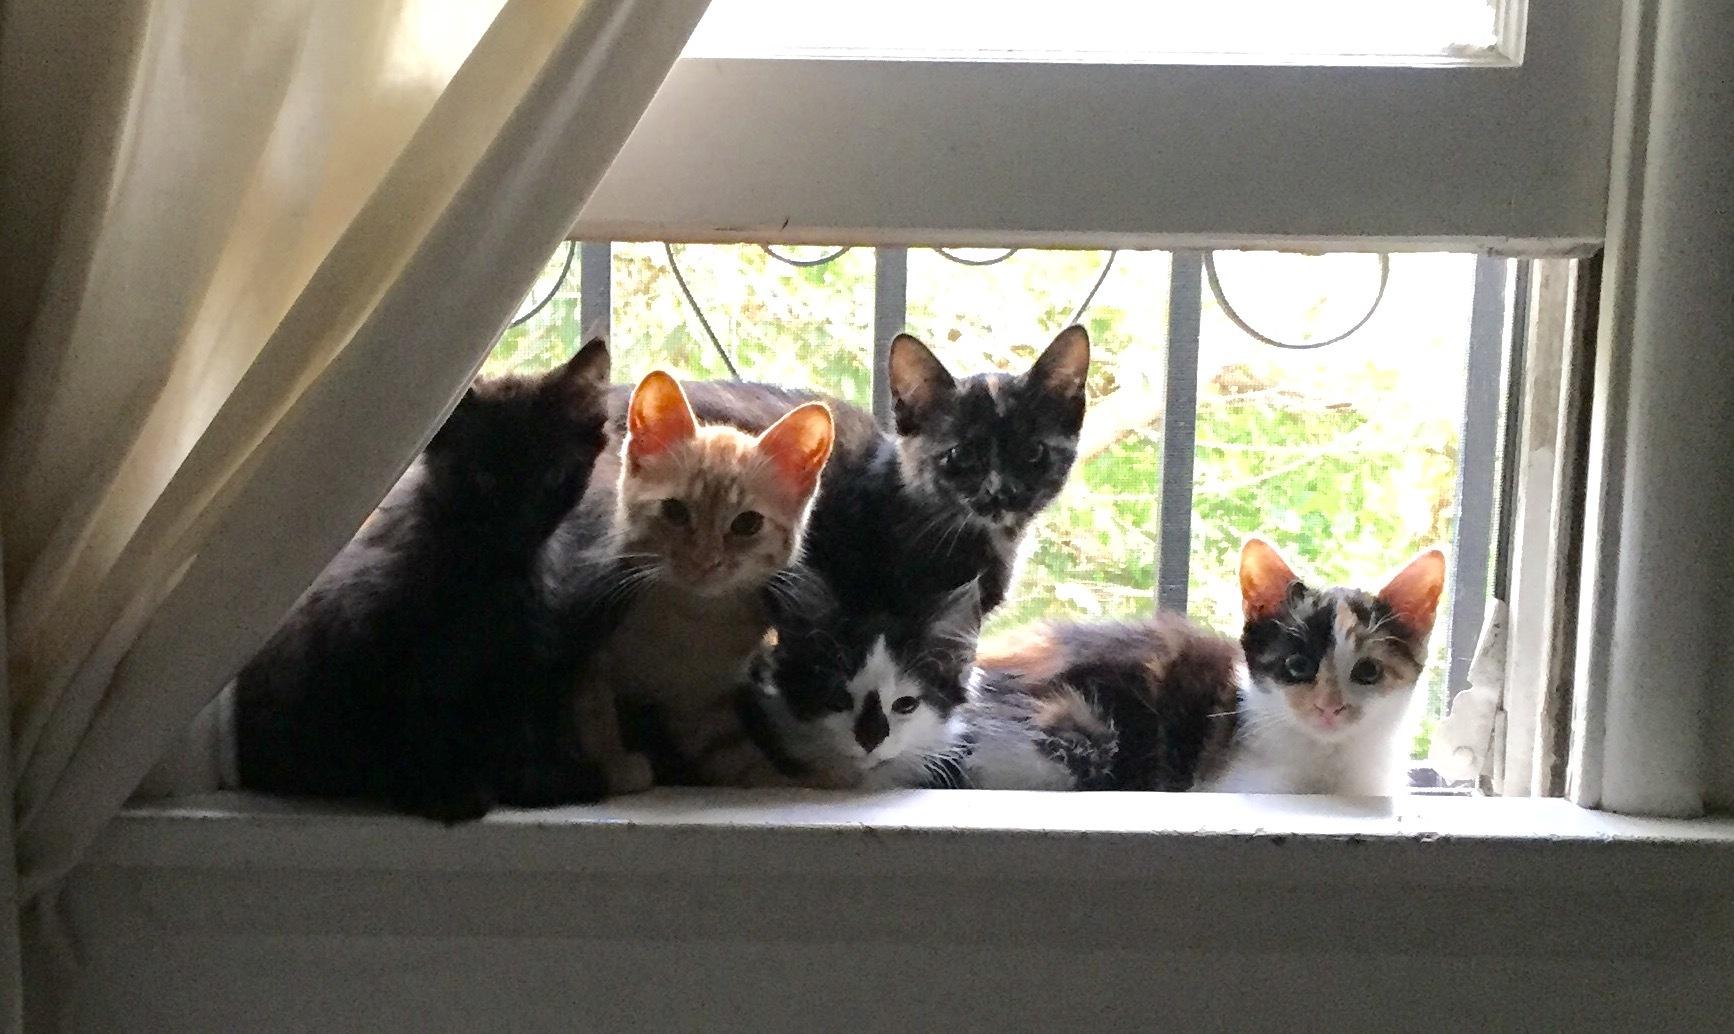 Always so many kittens in need